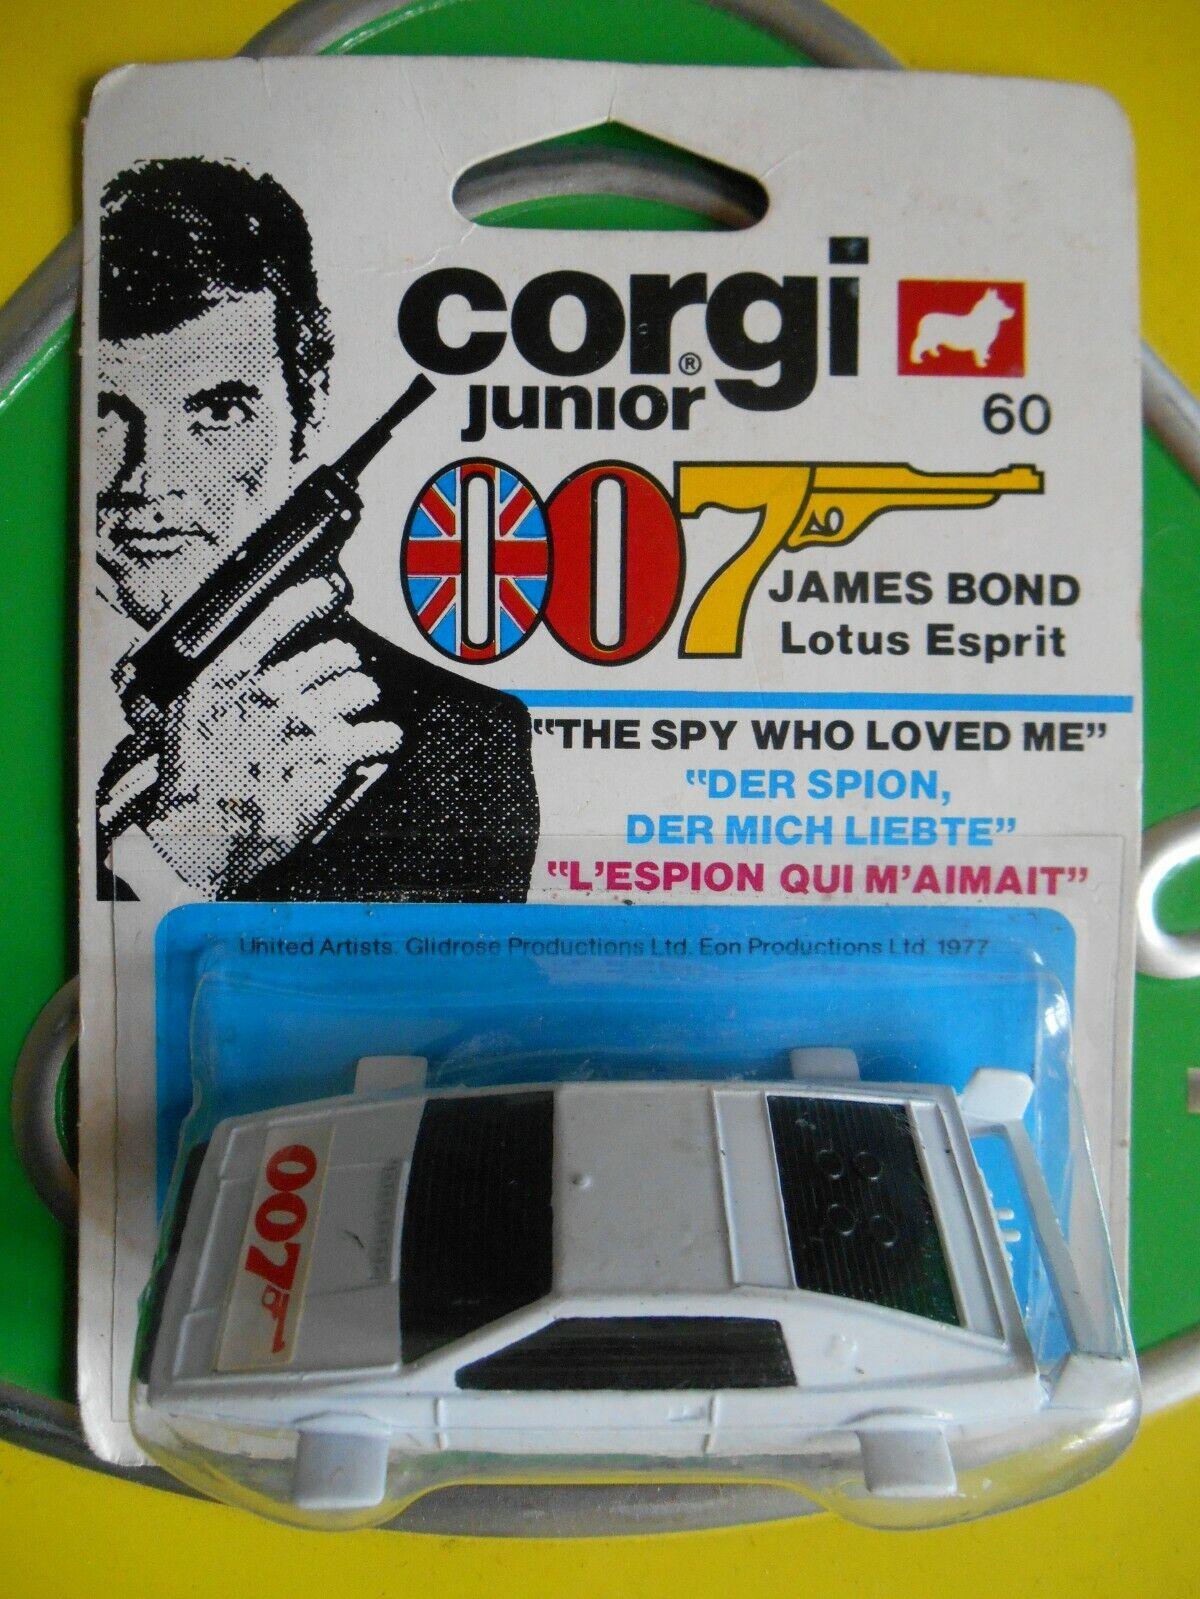 Corgi Junior 60 Lotus Esprit James Bond 007 Exceptional Card Blister Chapman